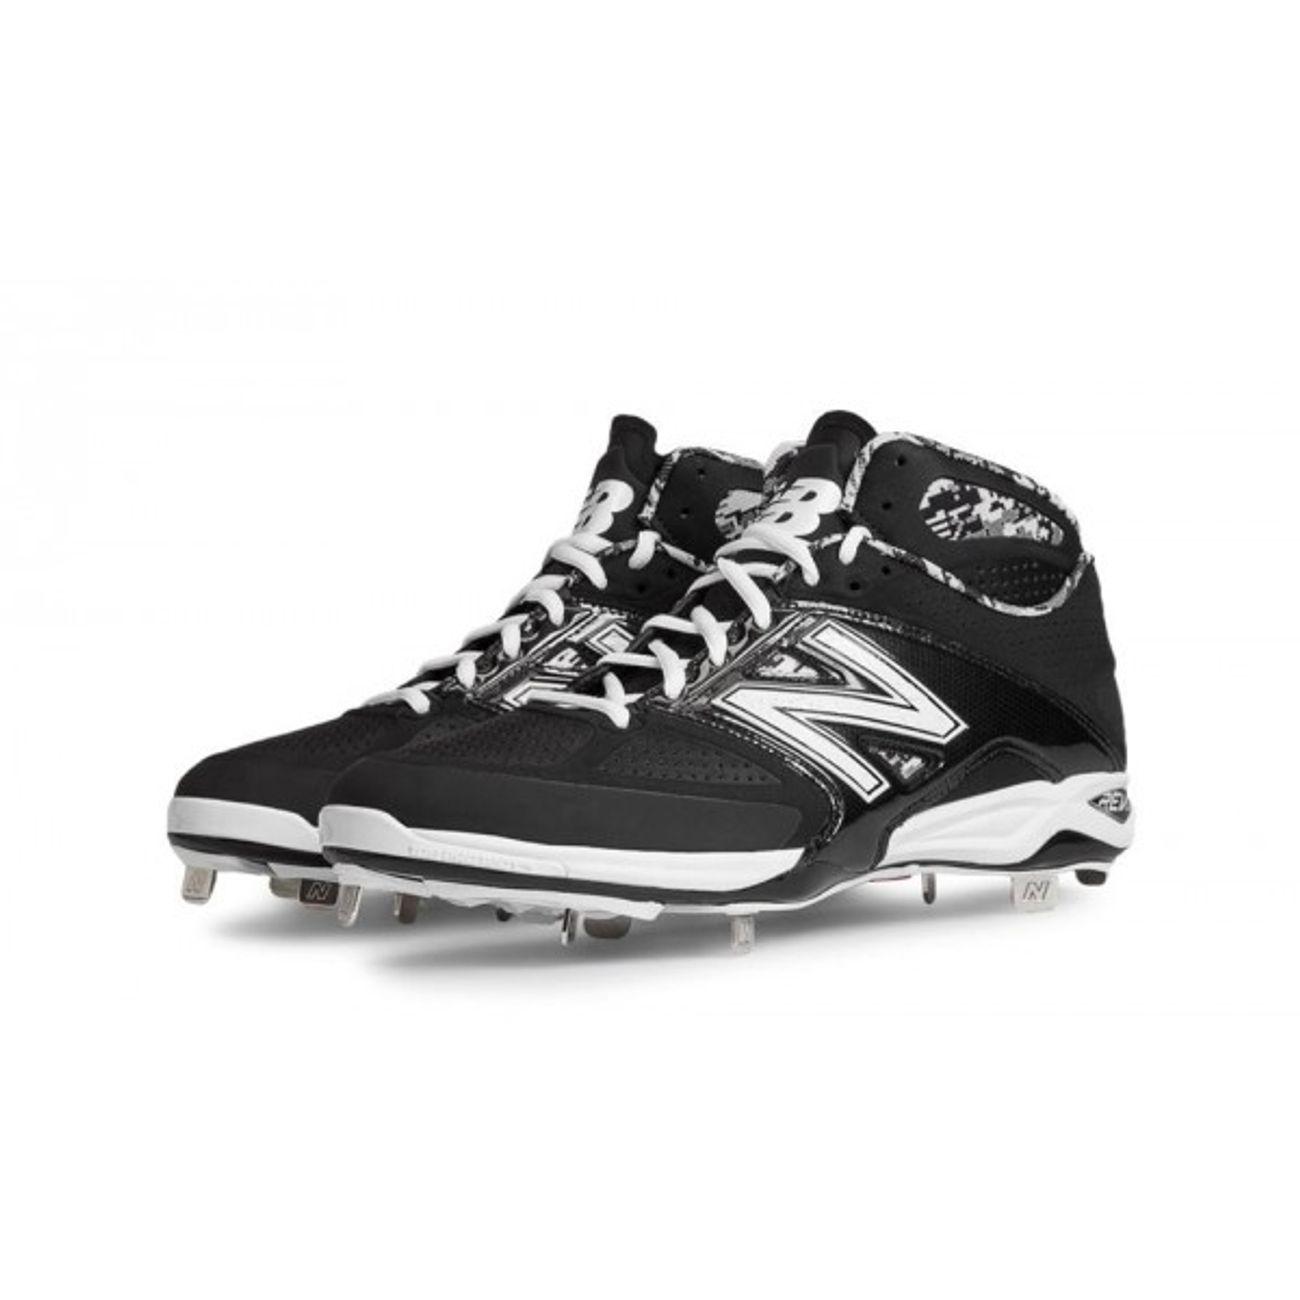 New Mid De Balance Spikes Cut Crampons Baseball Metal q1aCq